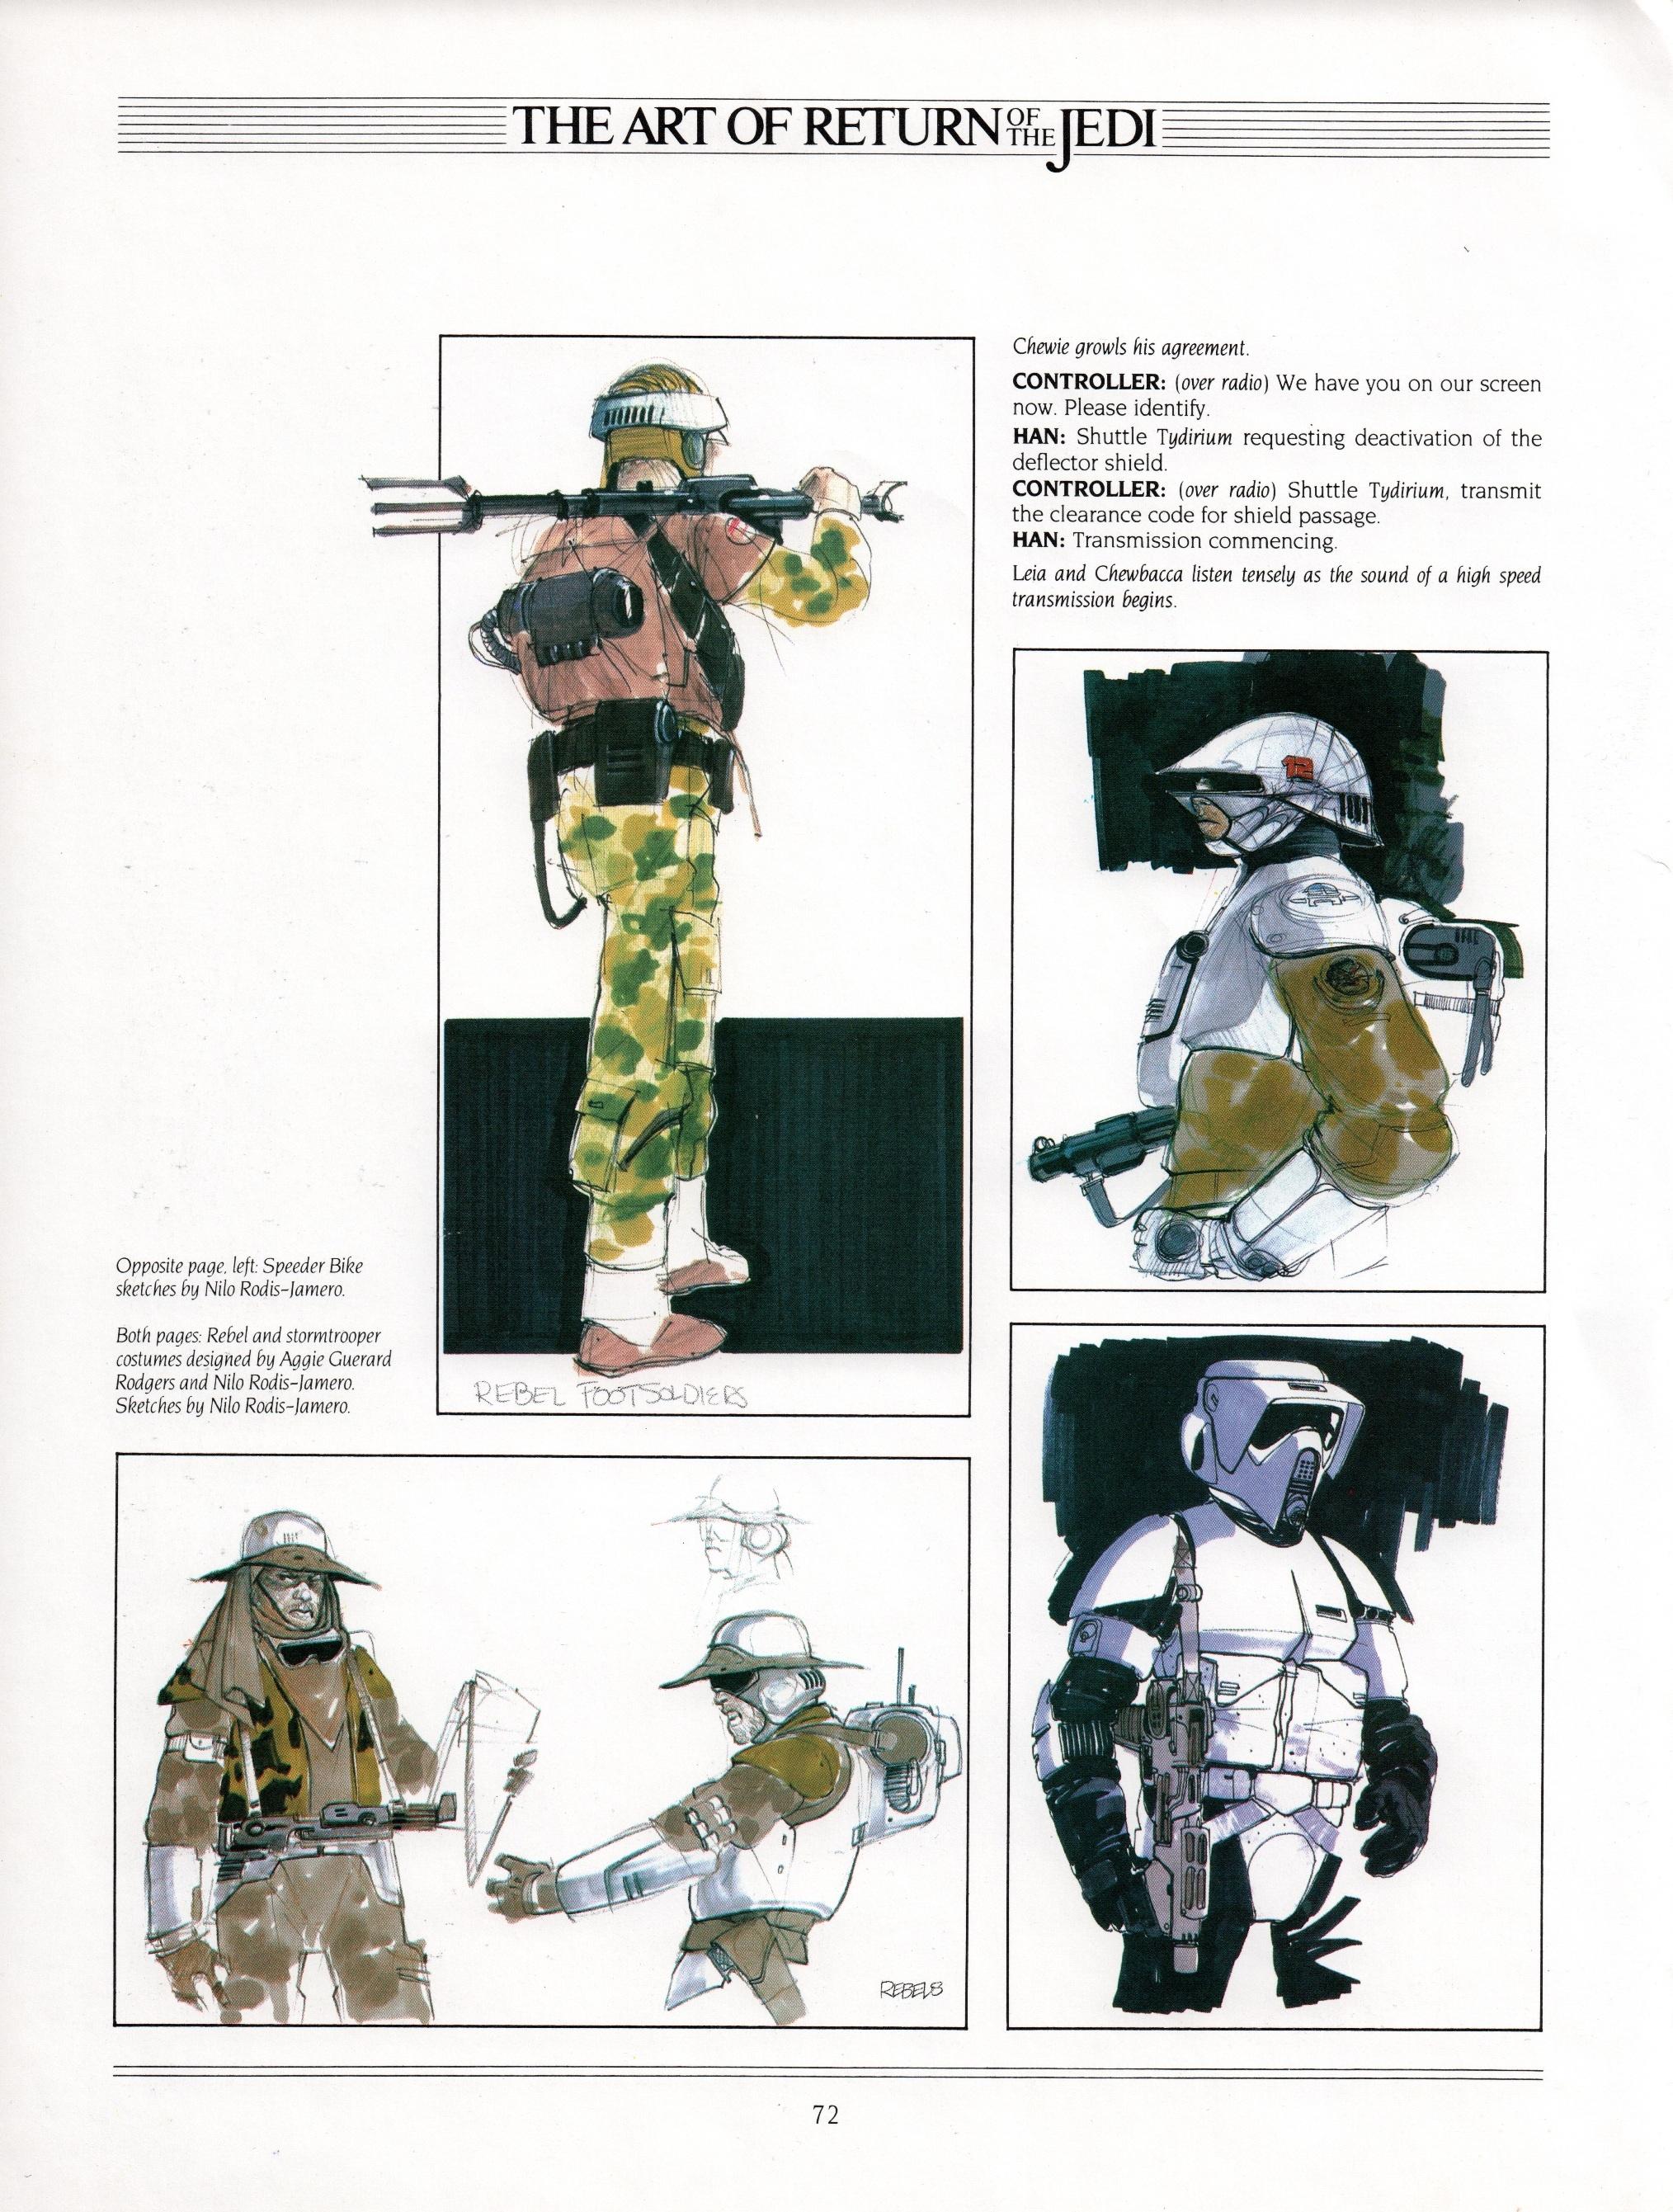 Art of Return of the Jedi (b0bafett_Empire)-p072